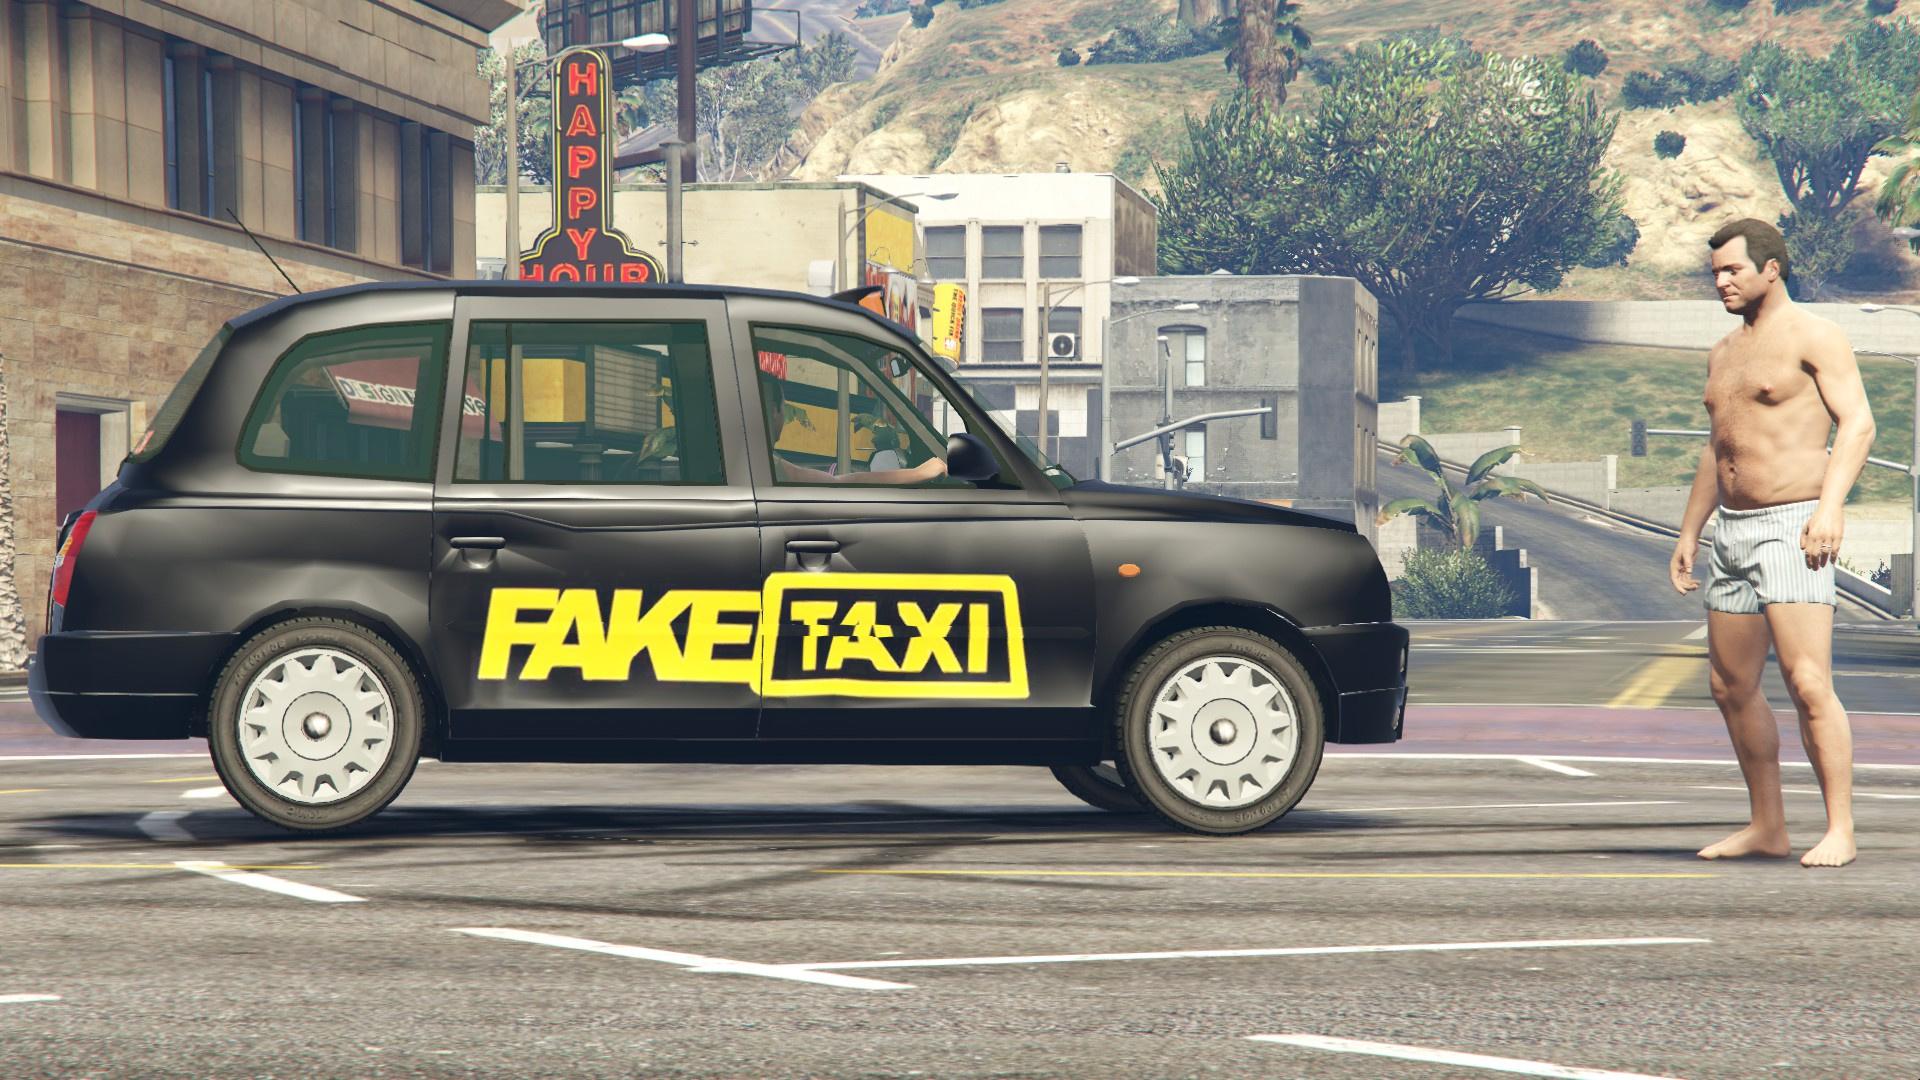 fake taxi livery gta5. Black Bedroom Furniture Sets. Home Design Ideas